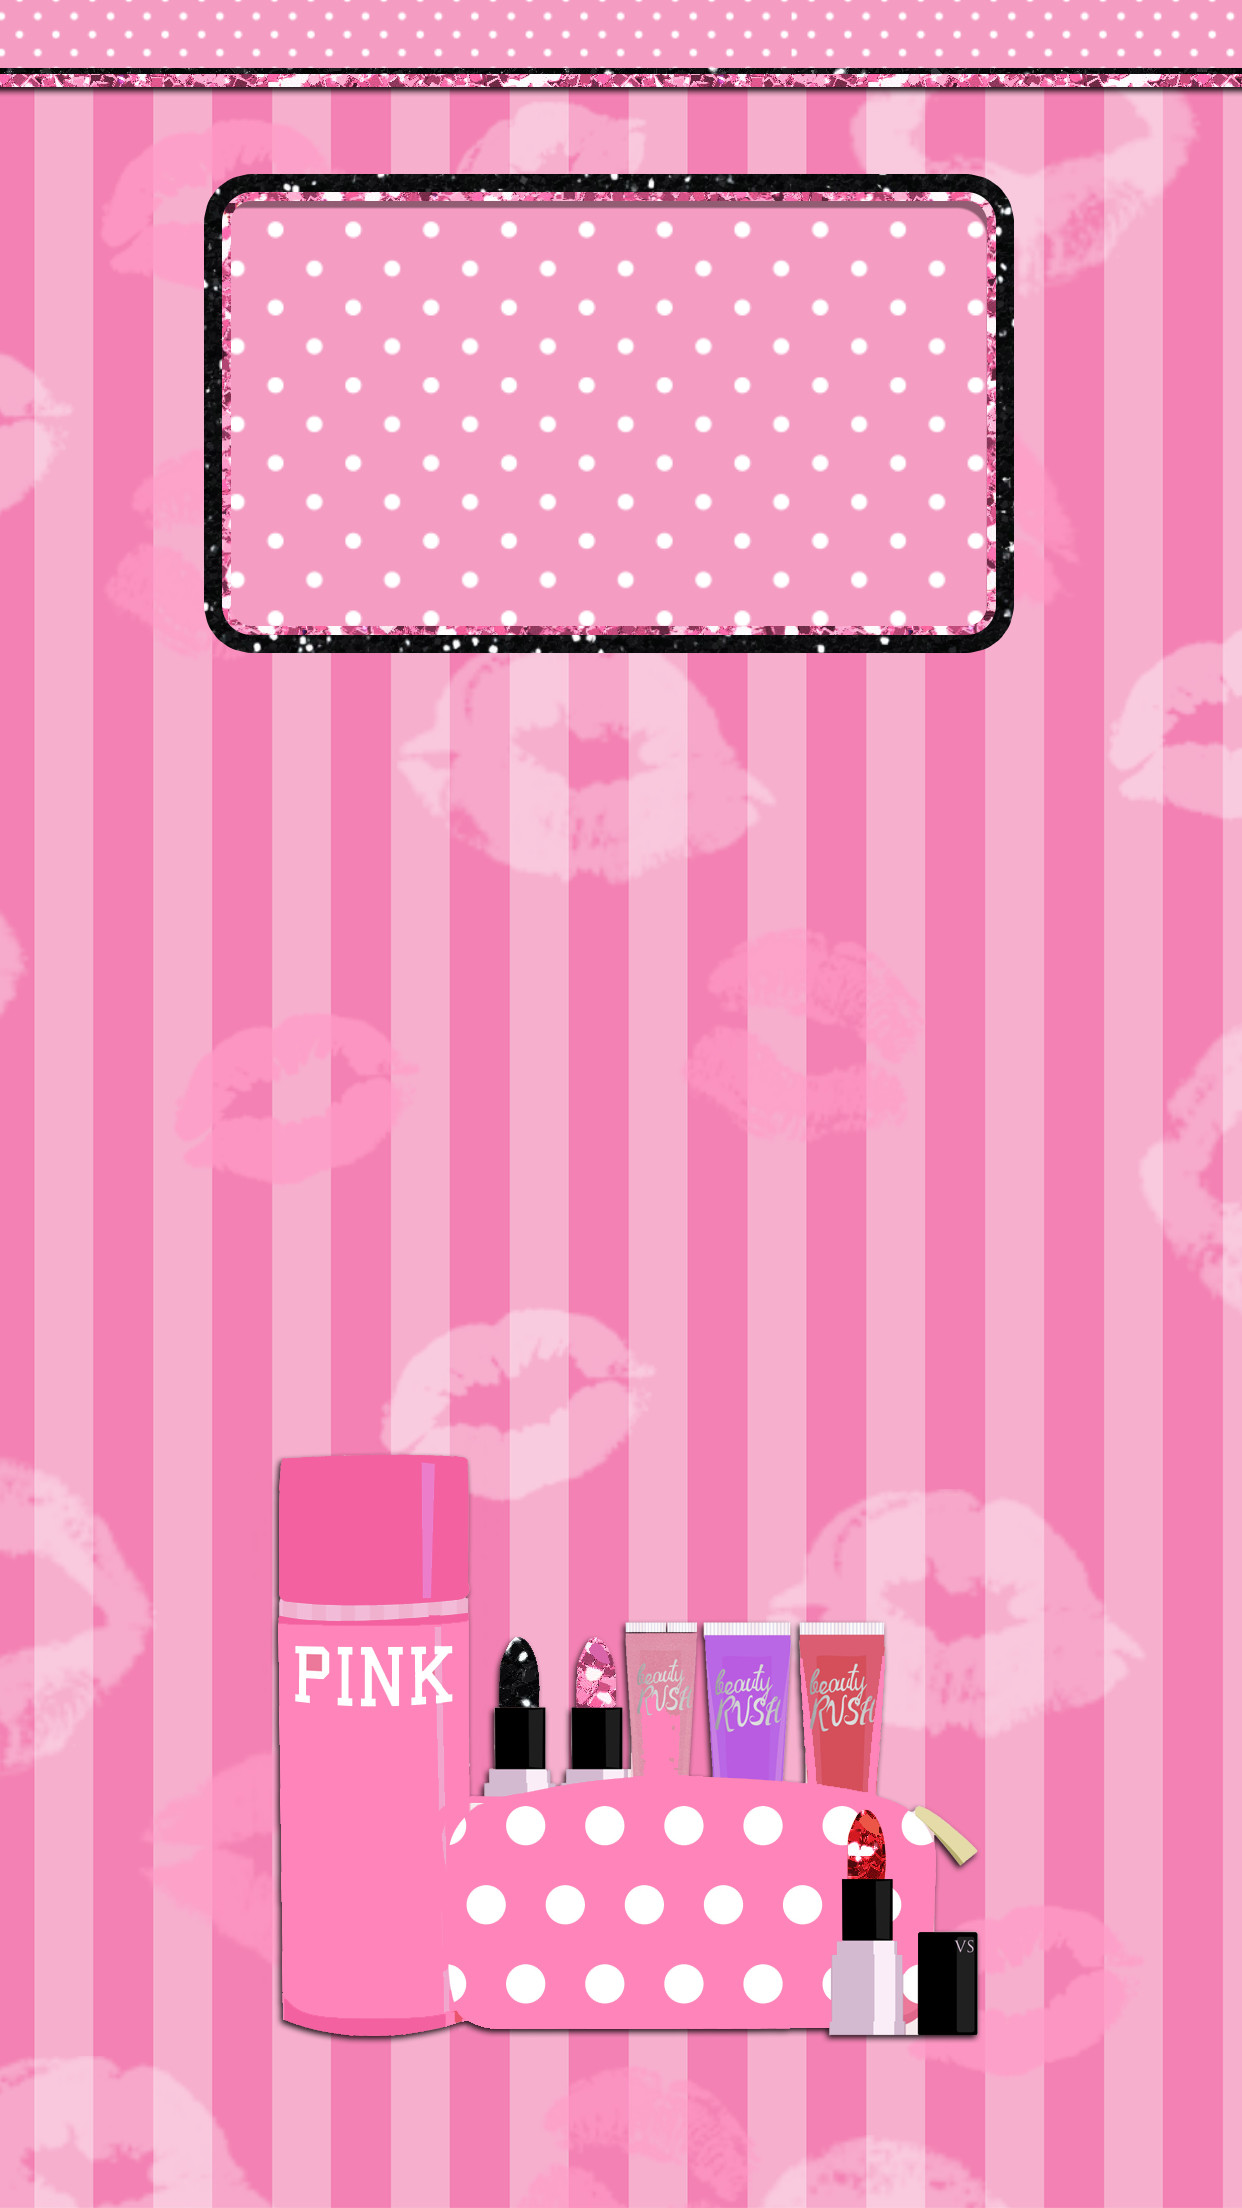 pink victoria secret iphone wallpapers 54 images